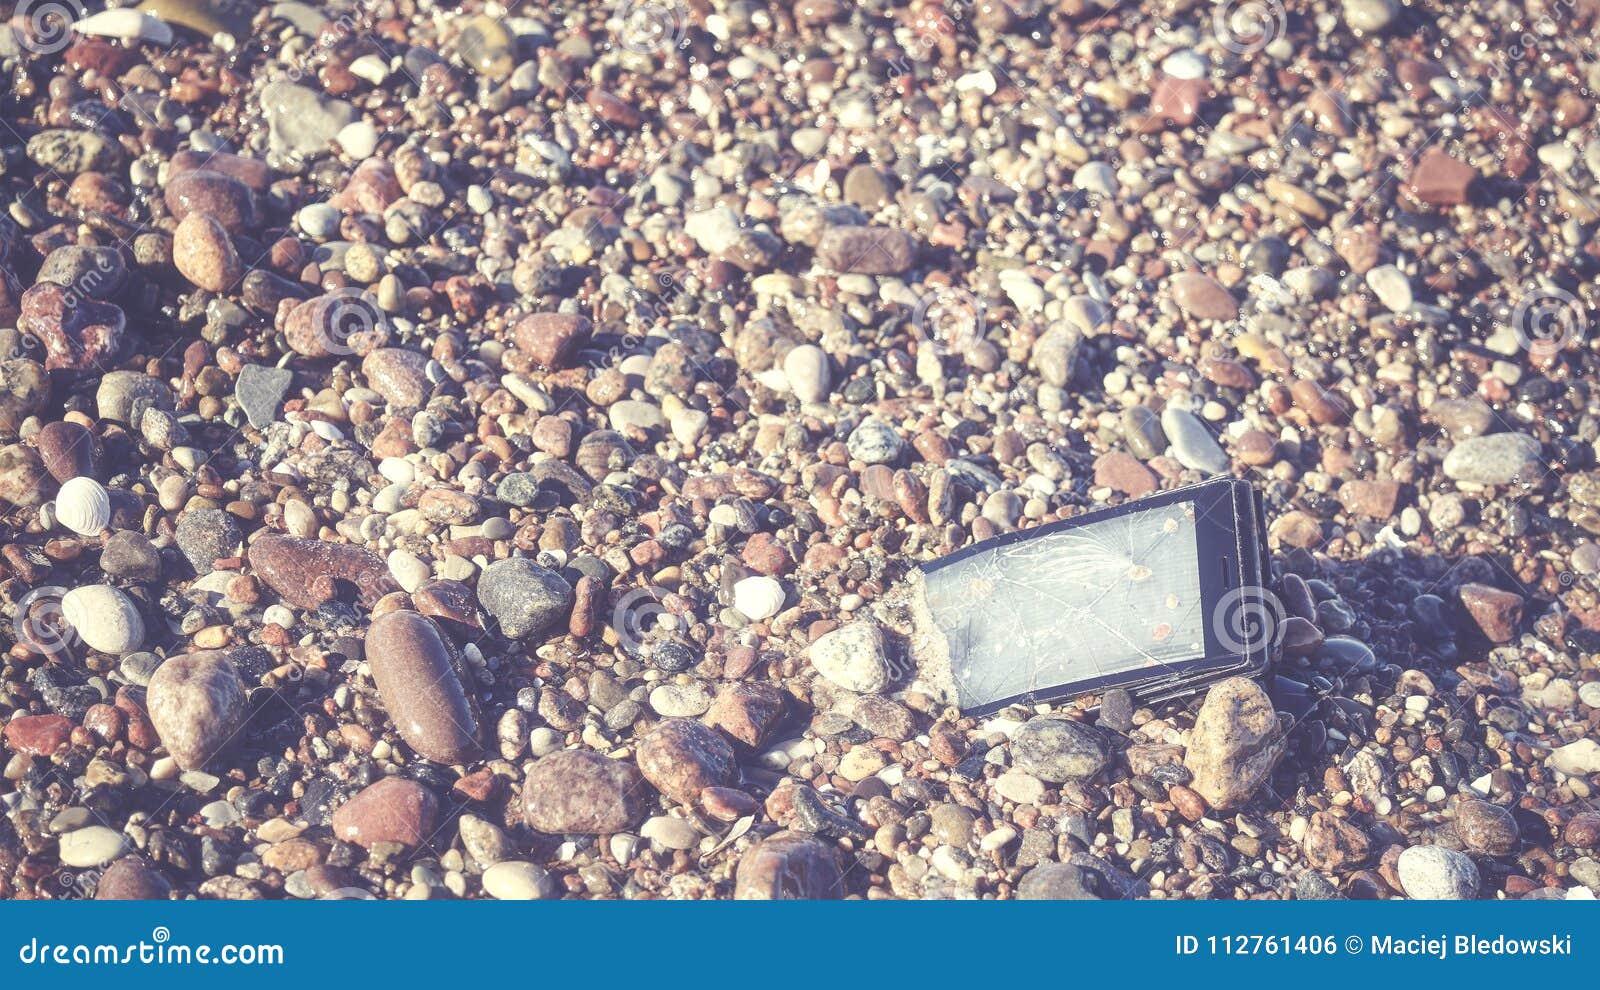 Broken mobile phone on a stony beach.